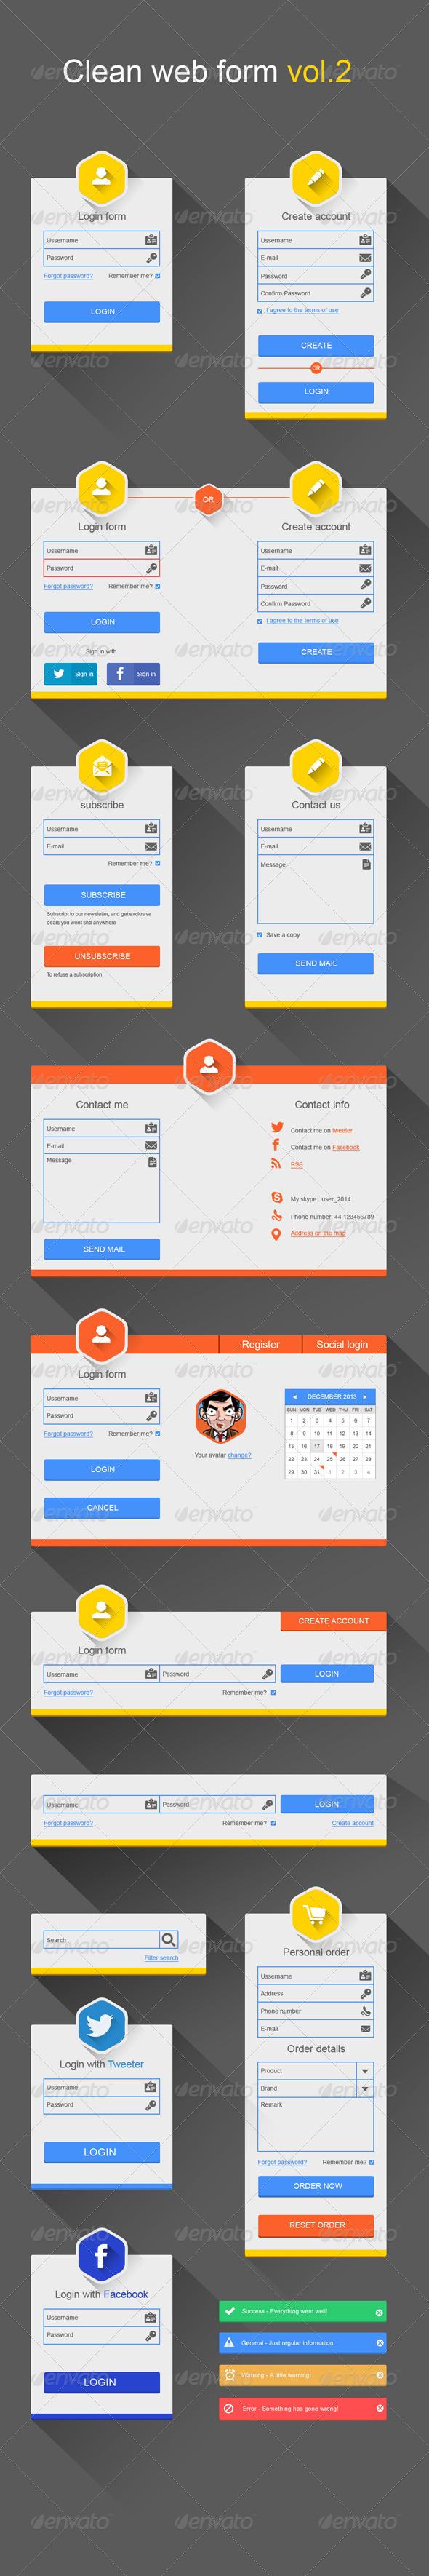 GraphicRiver Clean Web Forms Vol.2 6369740